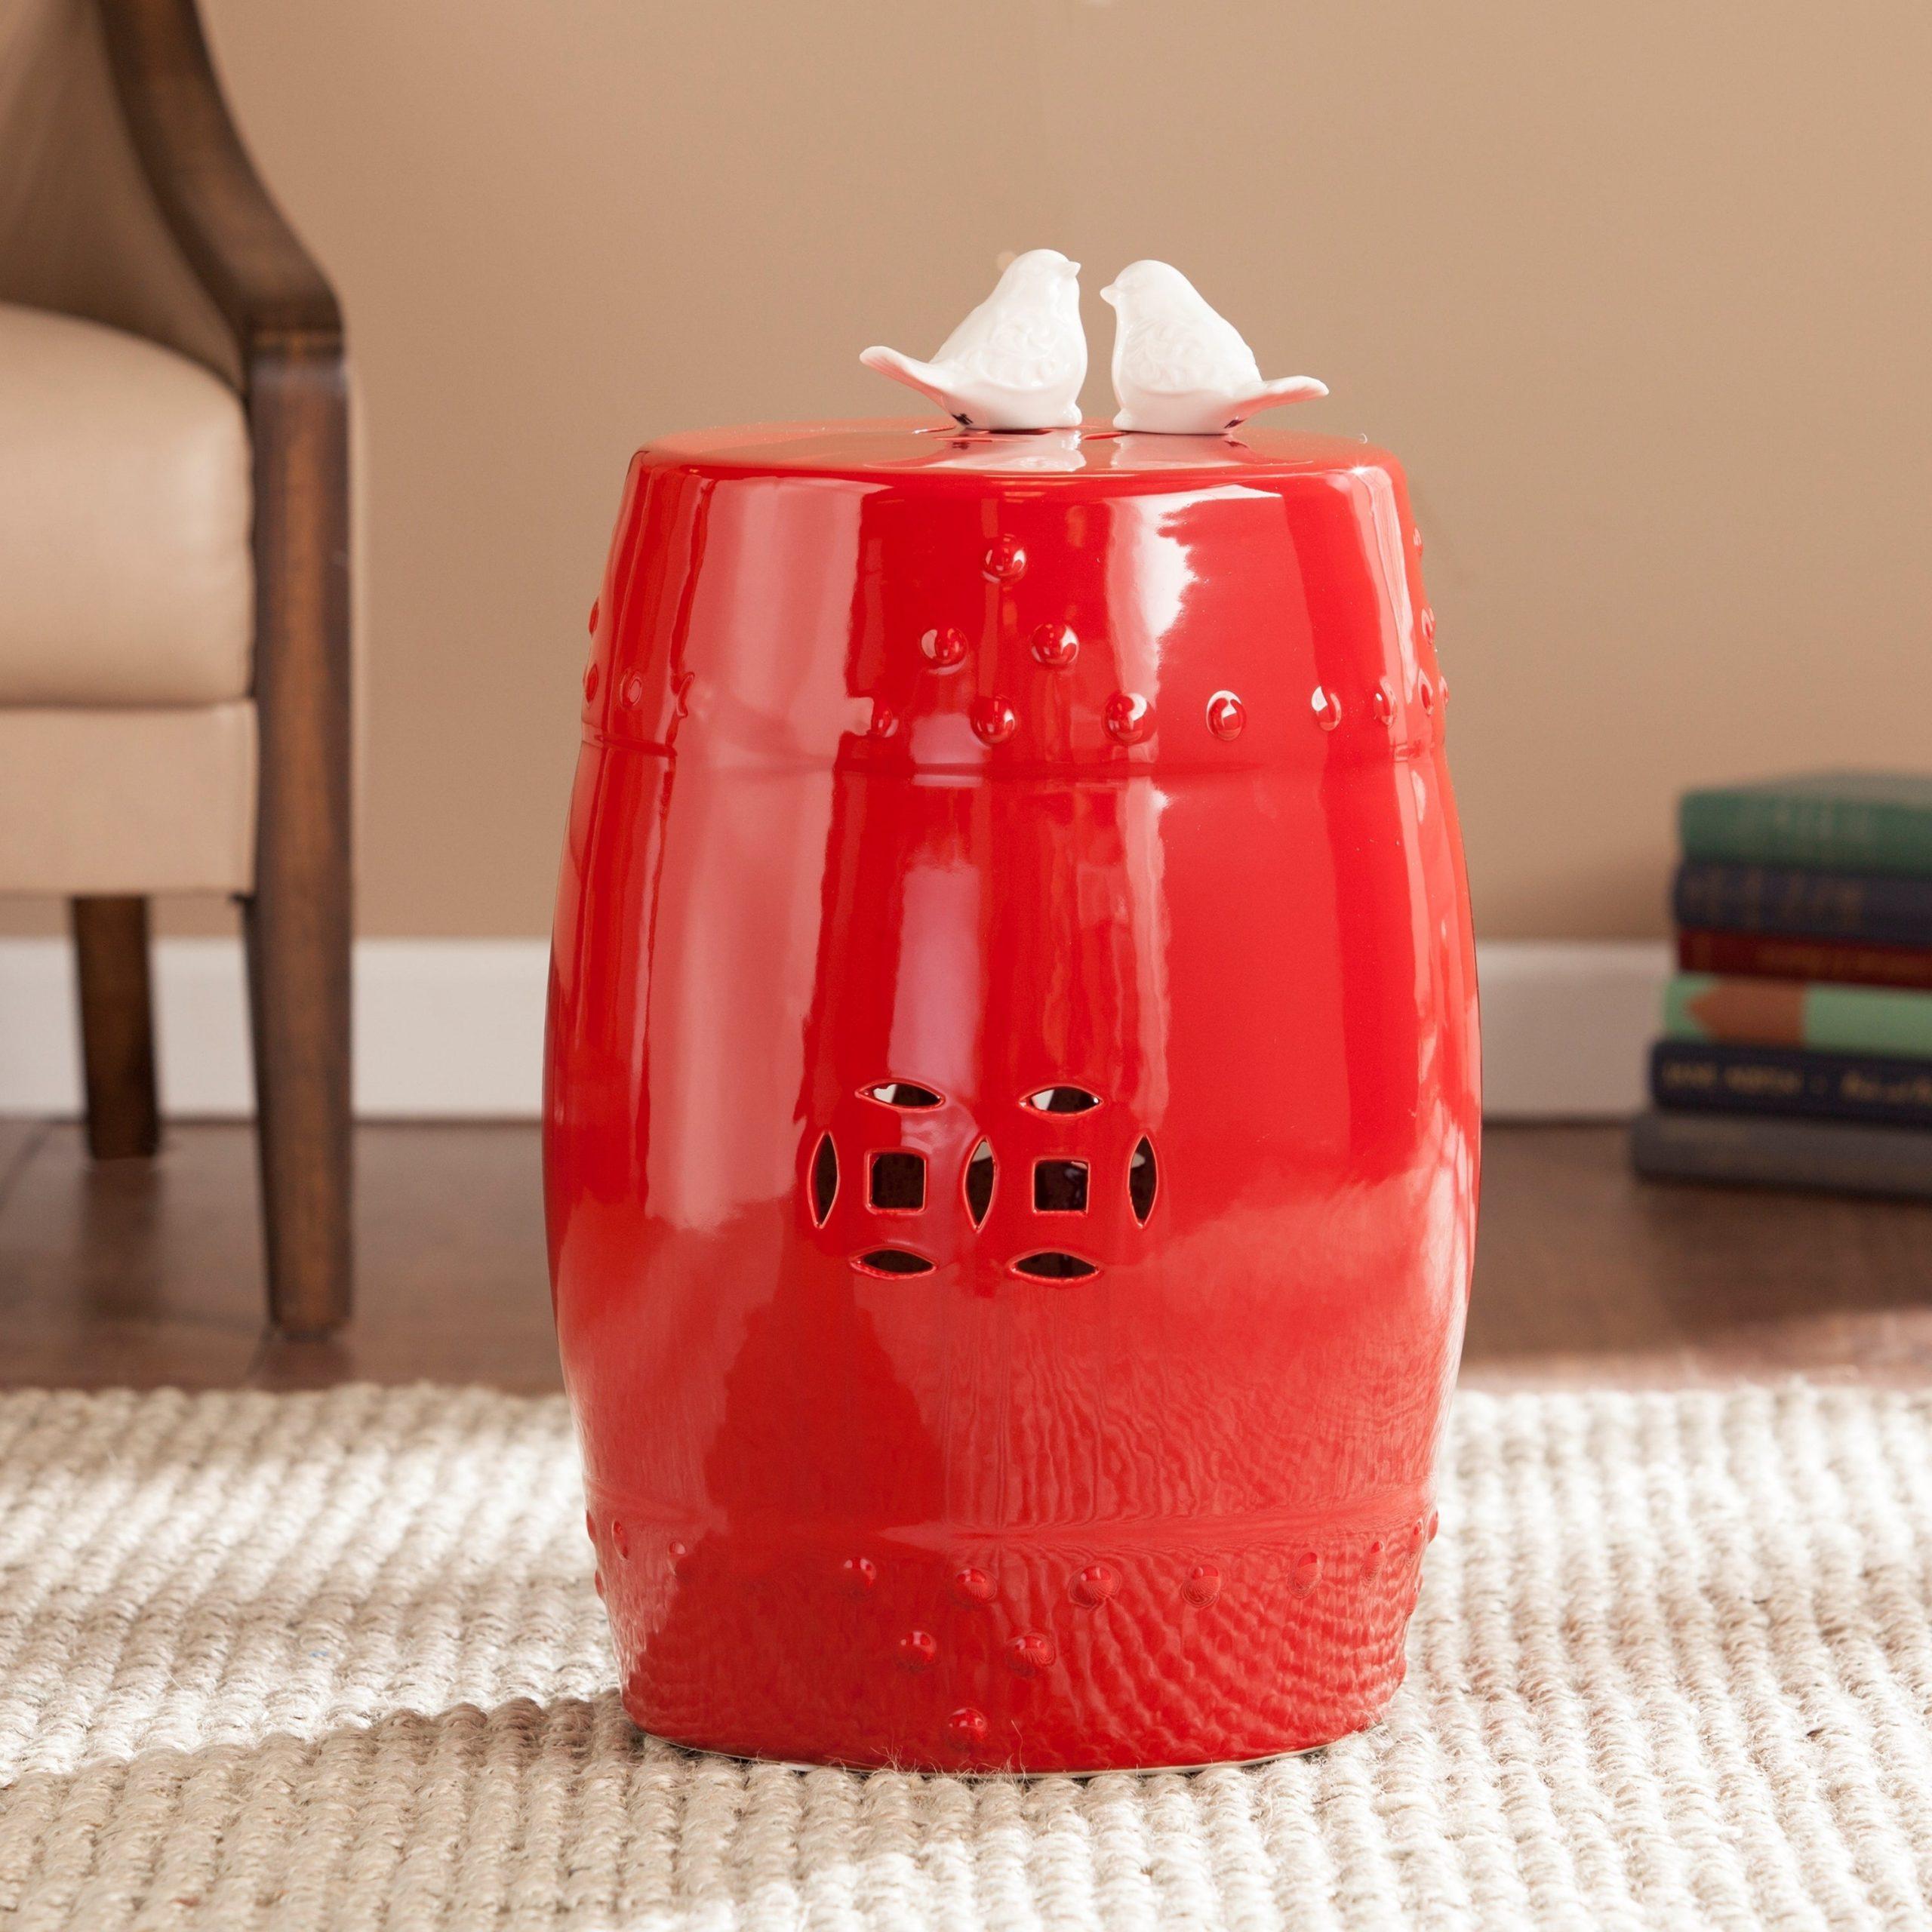 Salinas Poppy Red Ceramic Indoor/ Outdoor Accent Table/ Garden Stool Throughout Kujawa Ceramic Garden Stools (View 11 of 25)